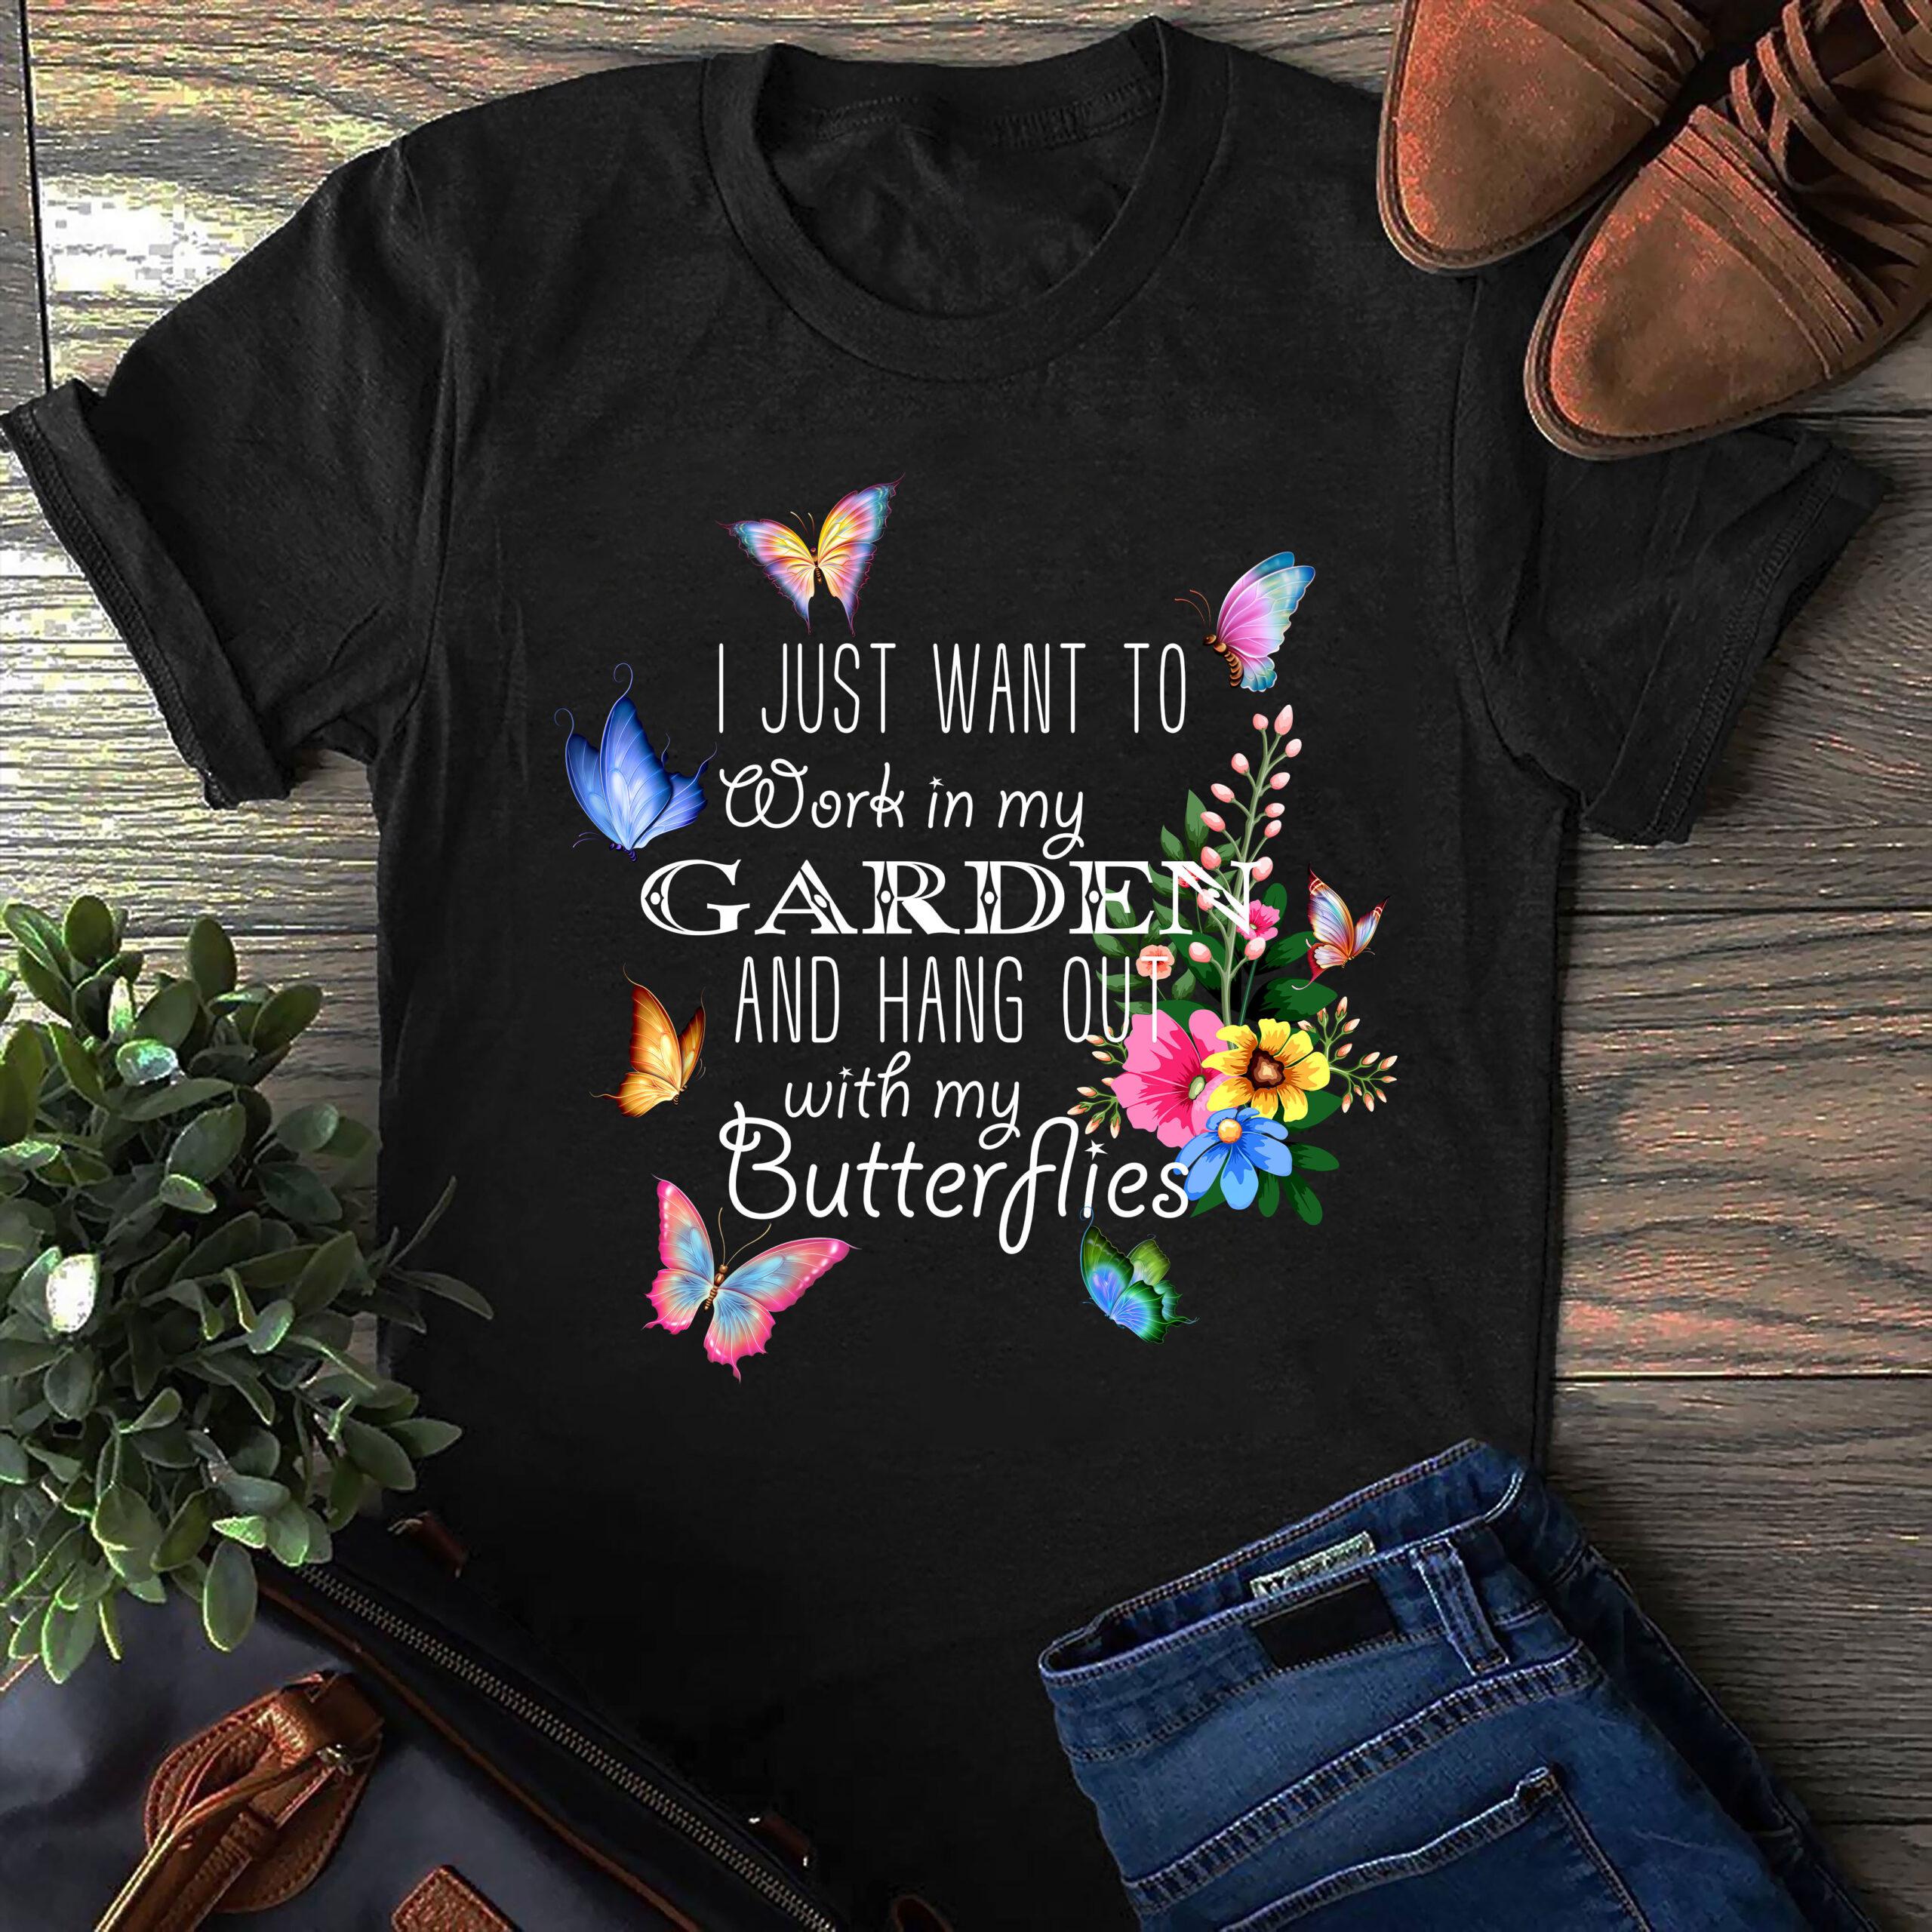 Garden Shirt Work In My Garden And Hang Out With Butterflies